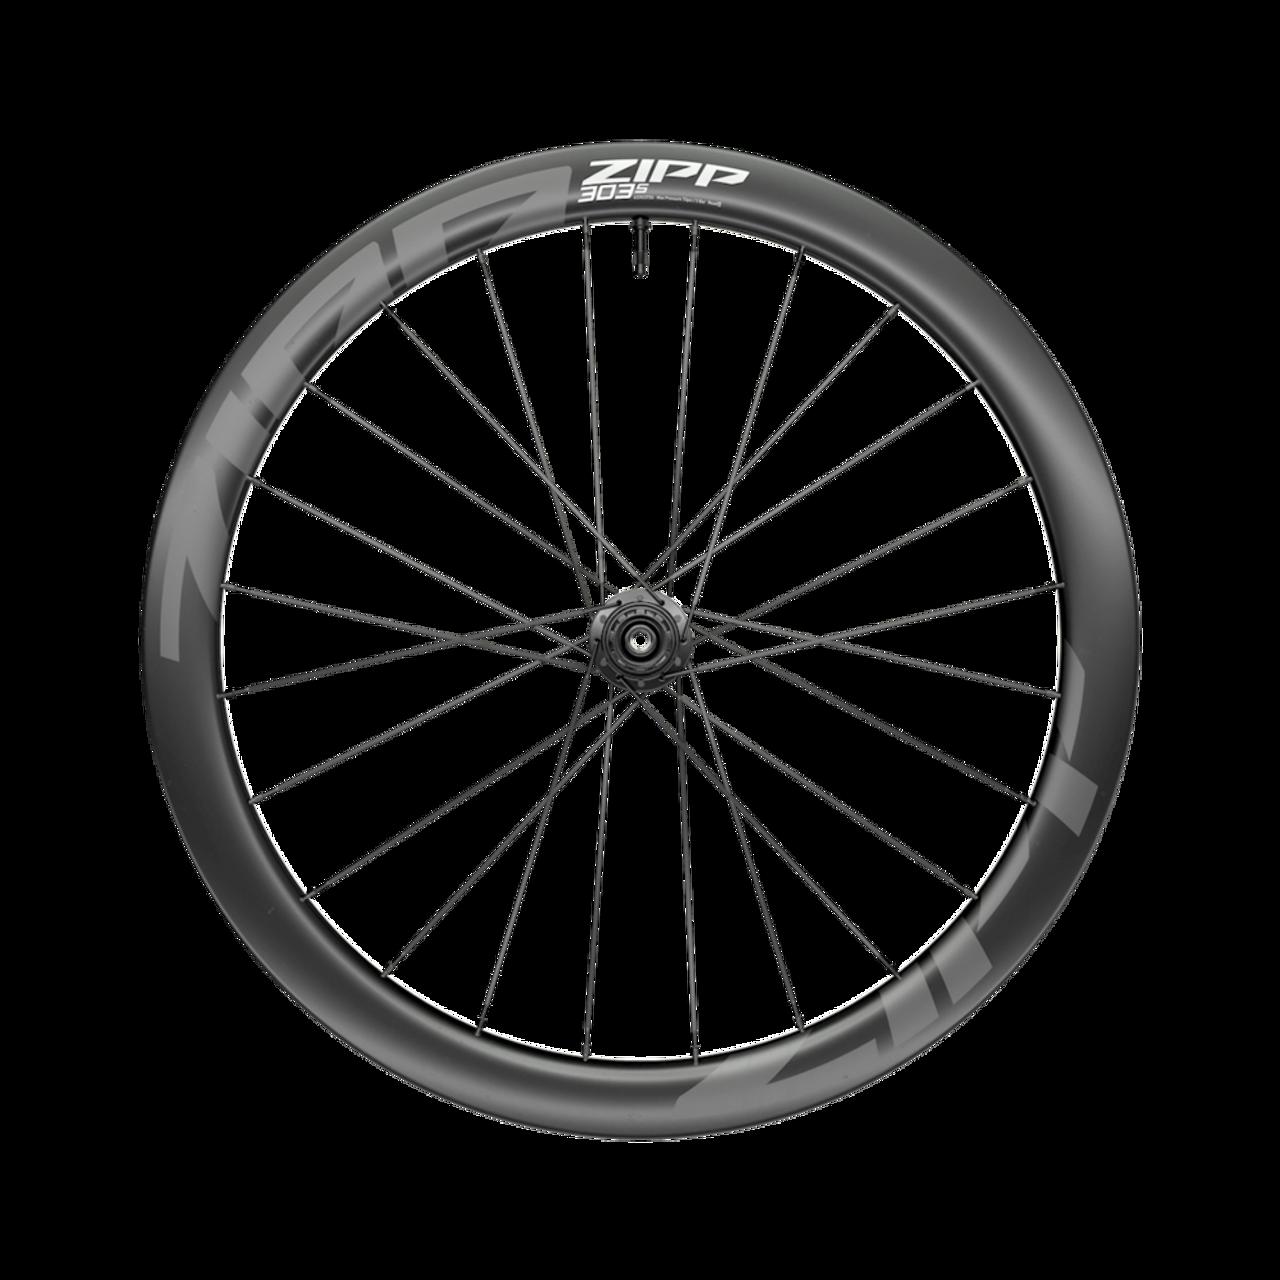 ZIPP 303 S Carbon Tubeless Ready Sram 10/11Speed Disc Brake Center Lockring 700C Rear Wheel